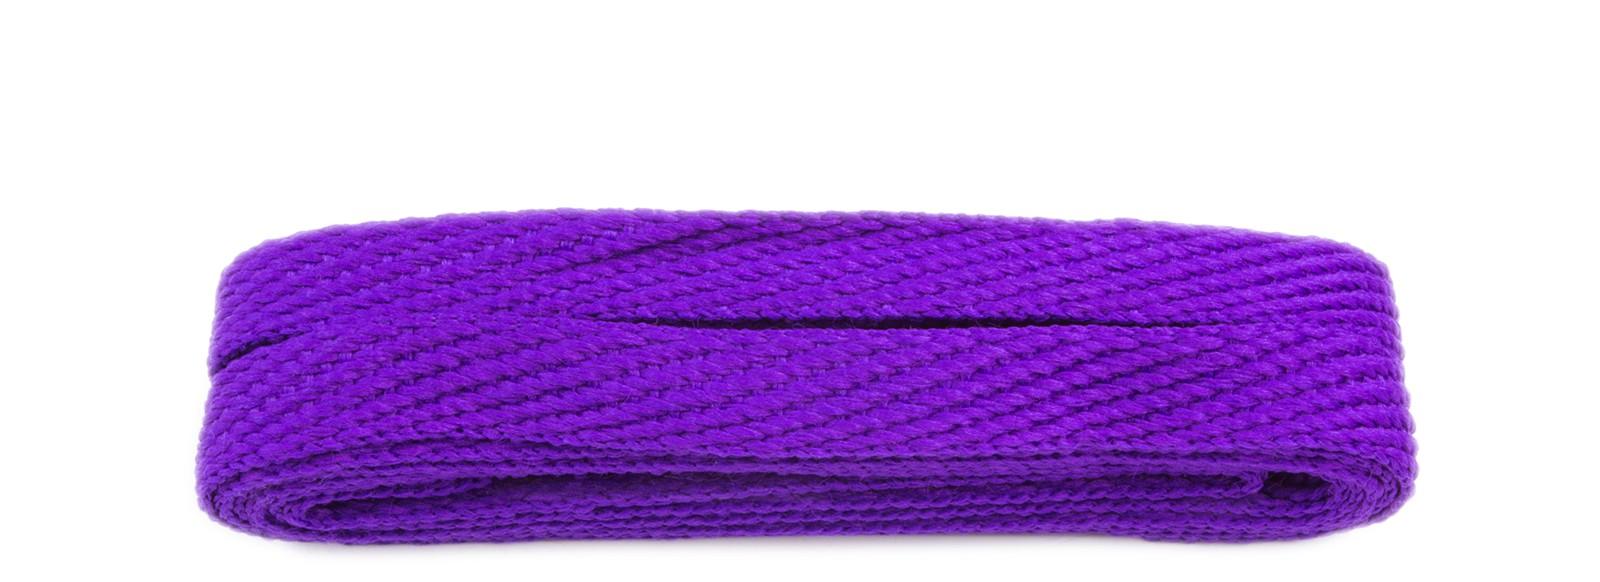 Purple 120cm American Flat 10mm Banded